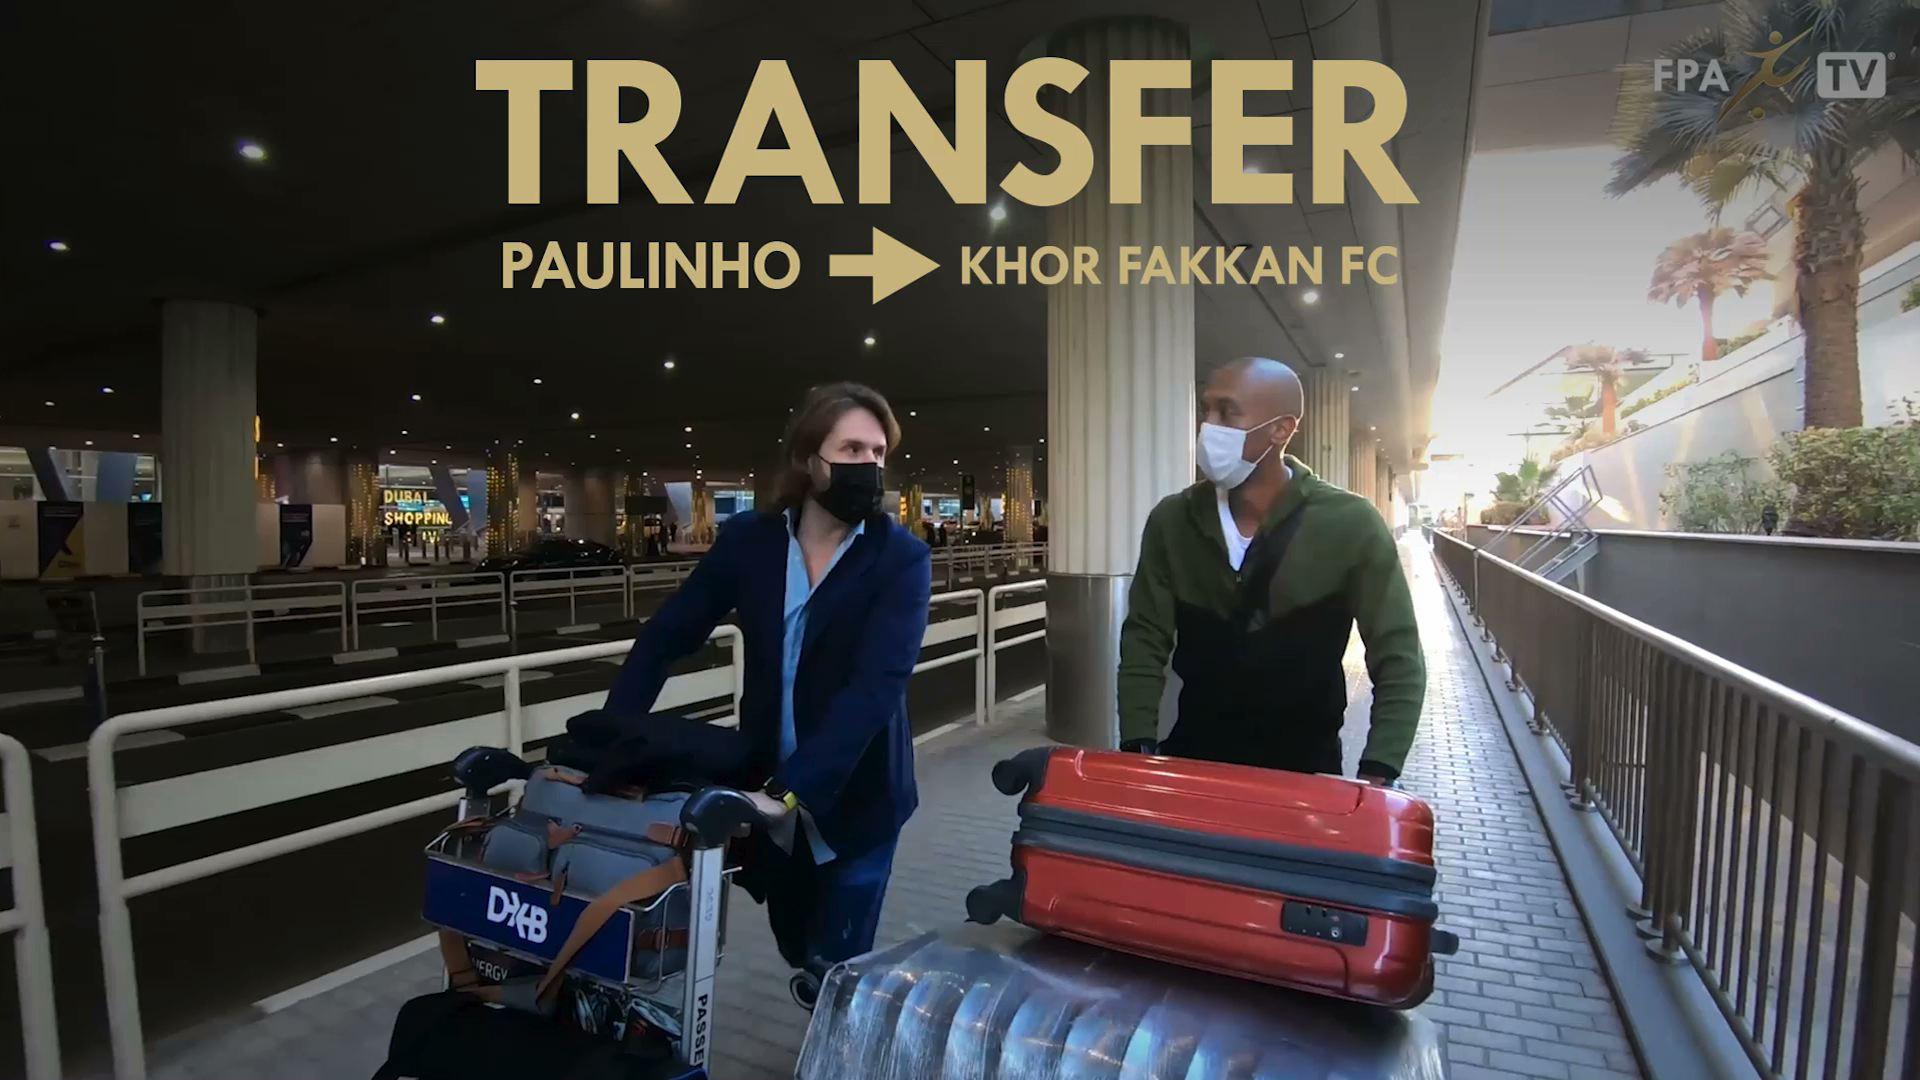 Paulinho Transfer to KhorFakkan